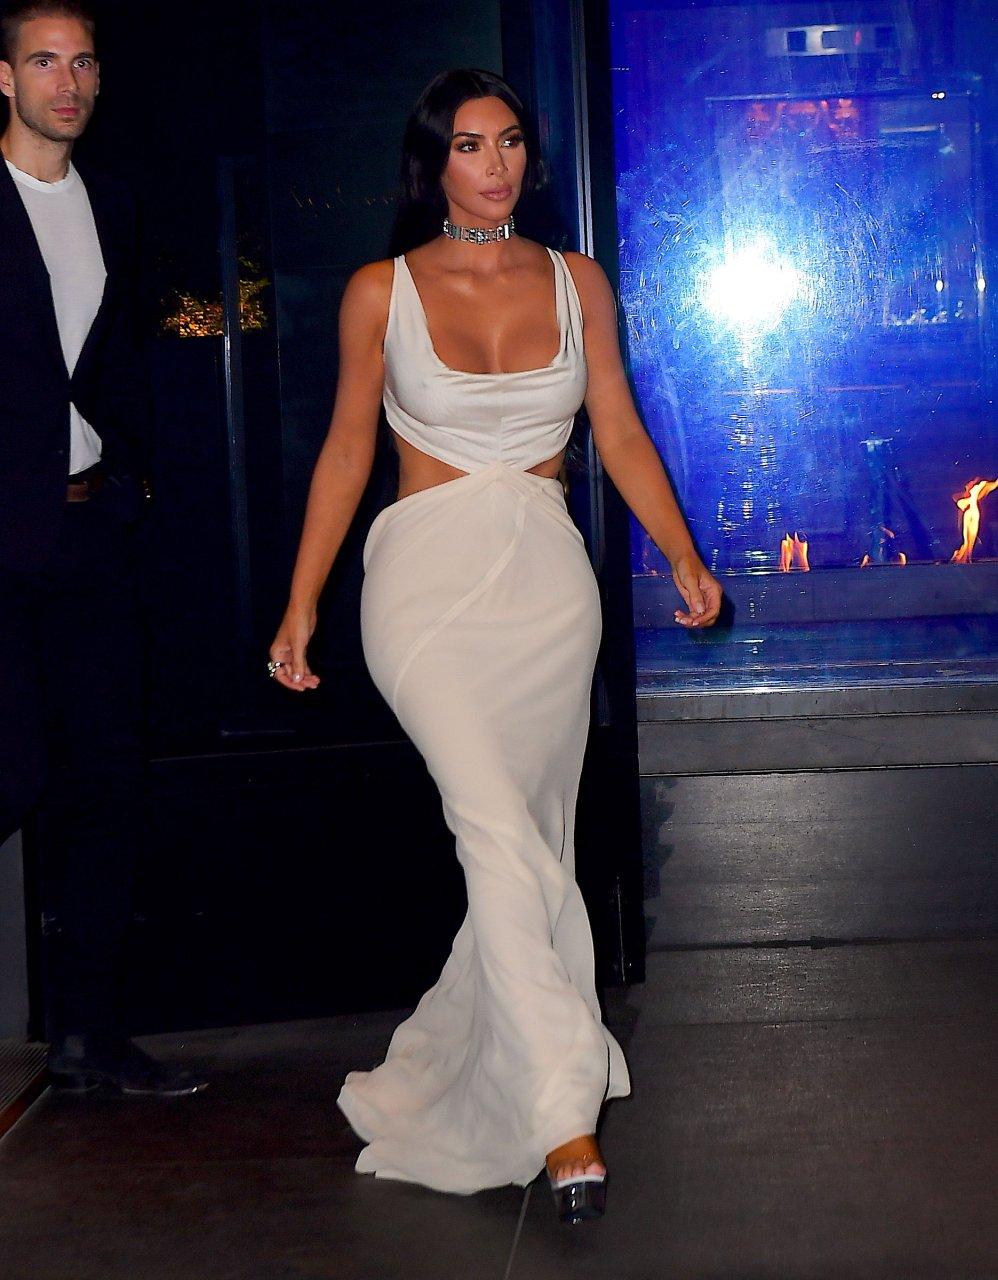 Kim-Kardashian-Sexy-TheFappeningBlog.com-34.jpg